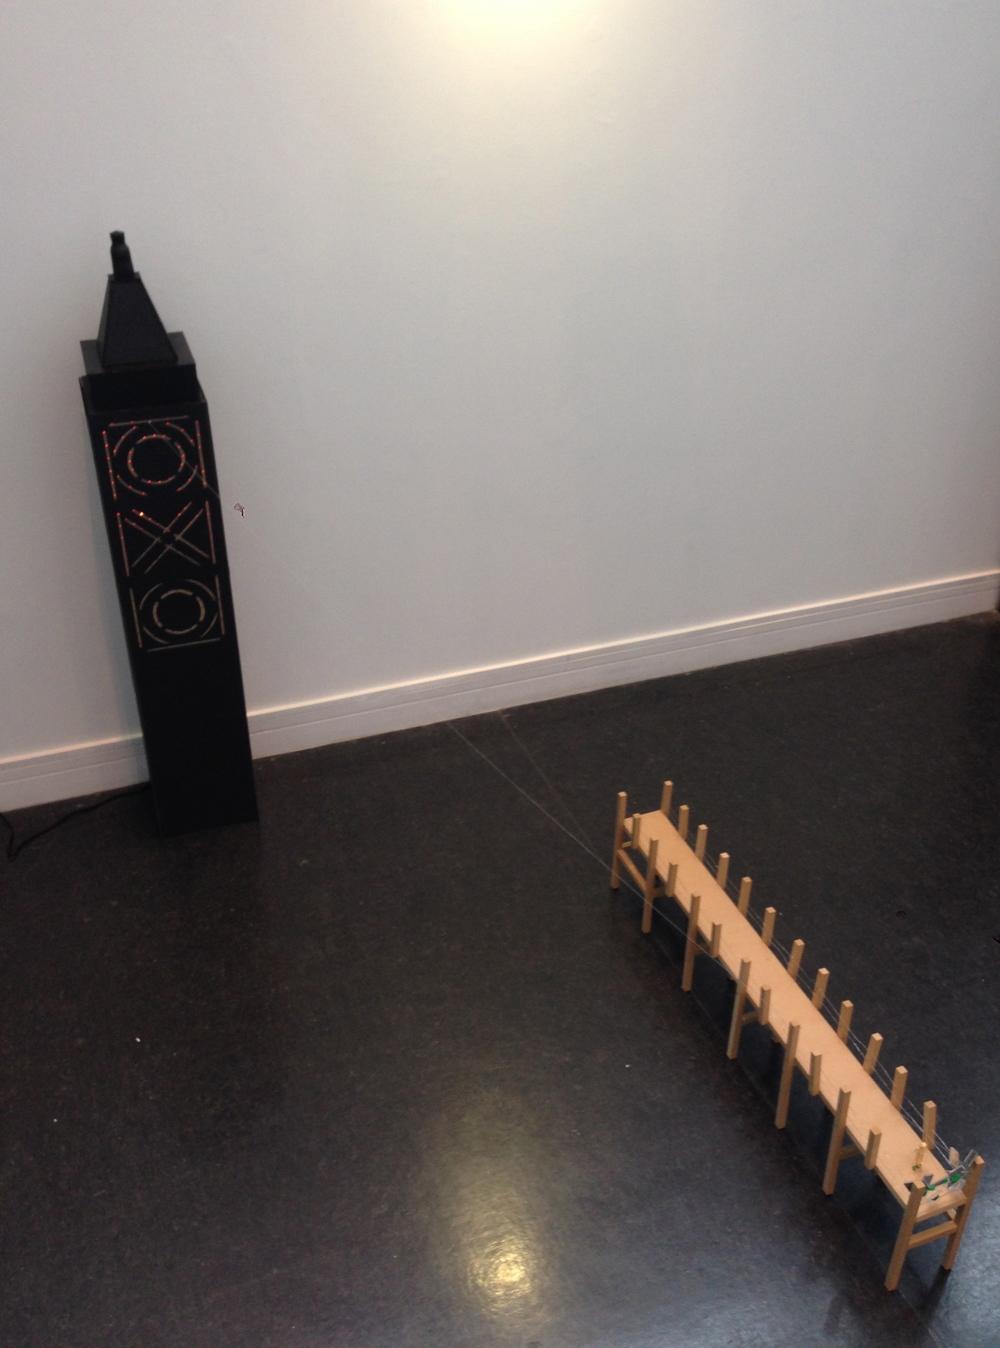 1/25 scale model